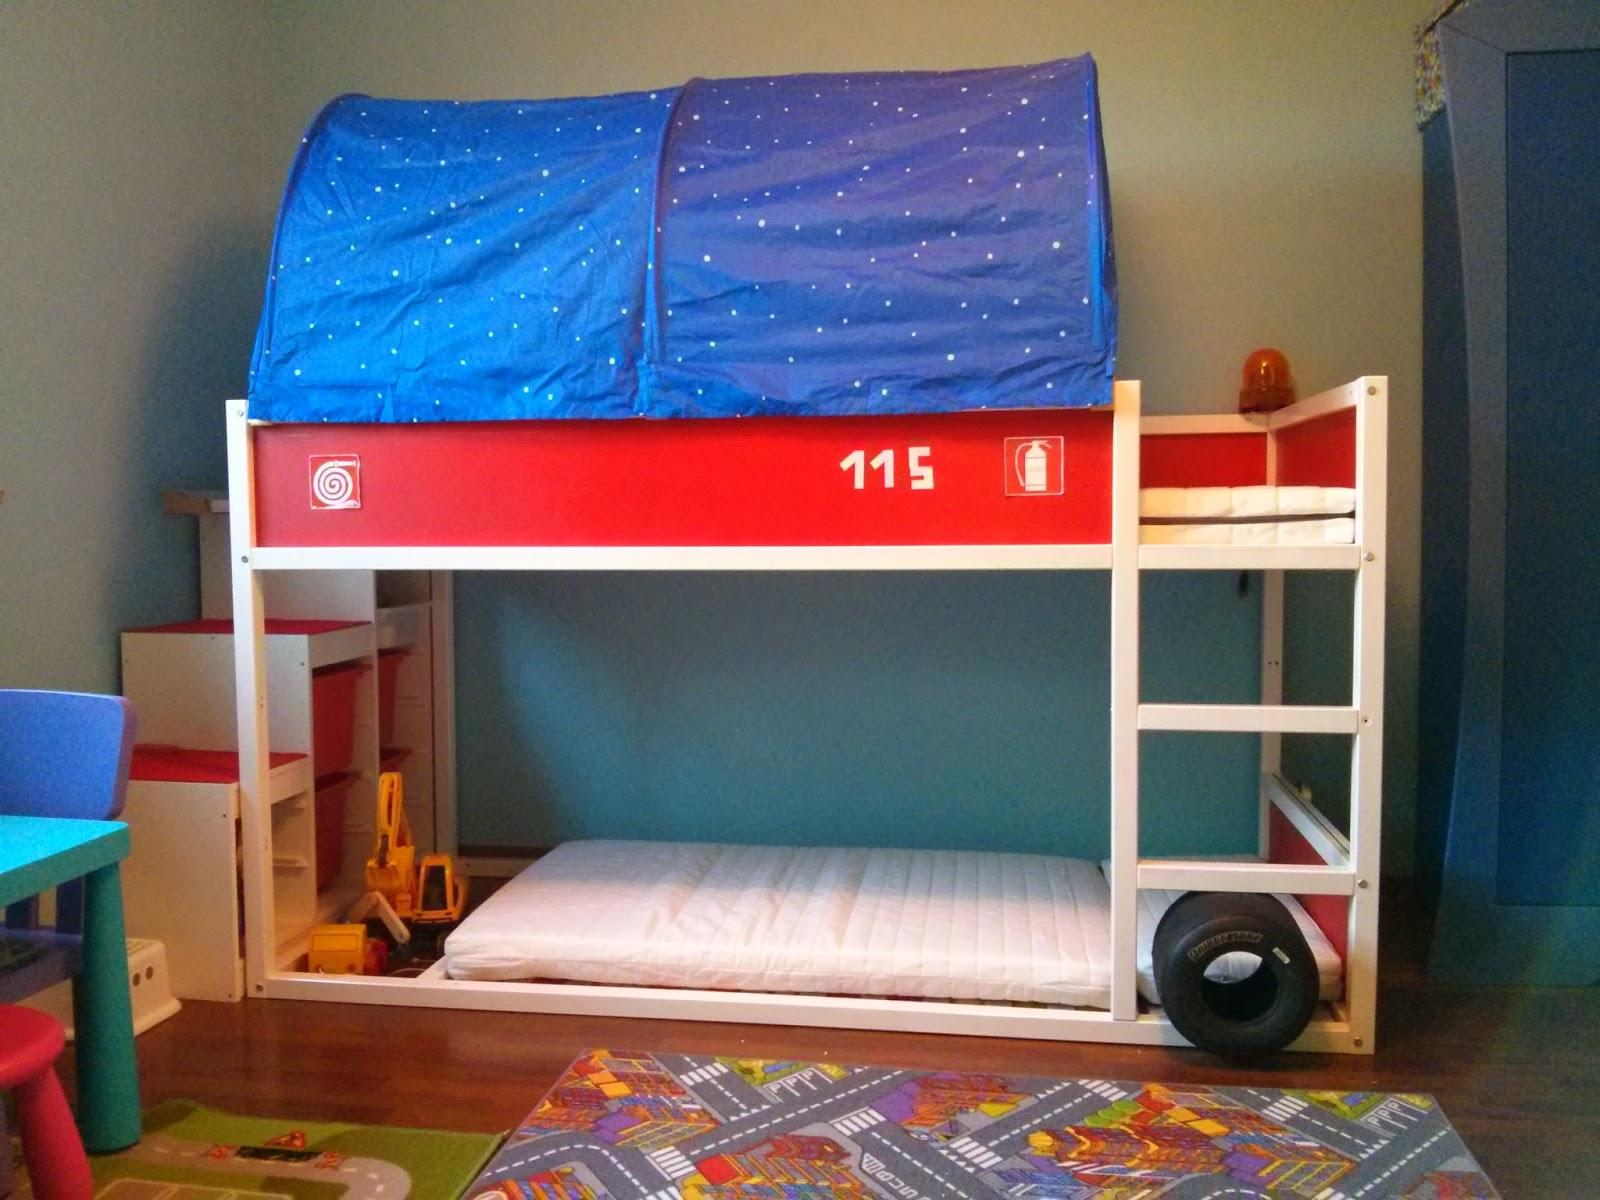 Ikea catalogo divani letto stunning letto rotondo ikea - Ikea bari camerette ...